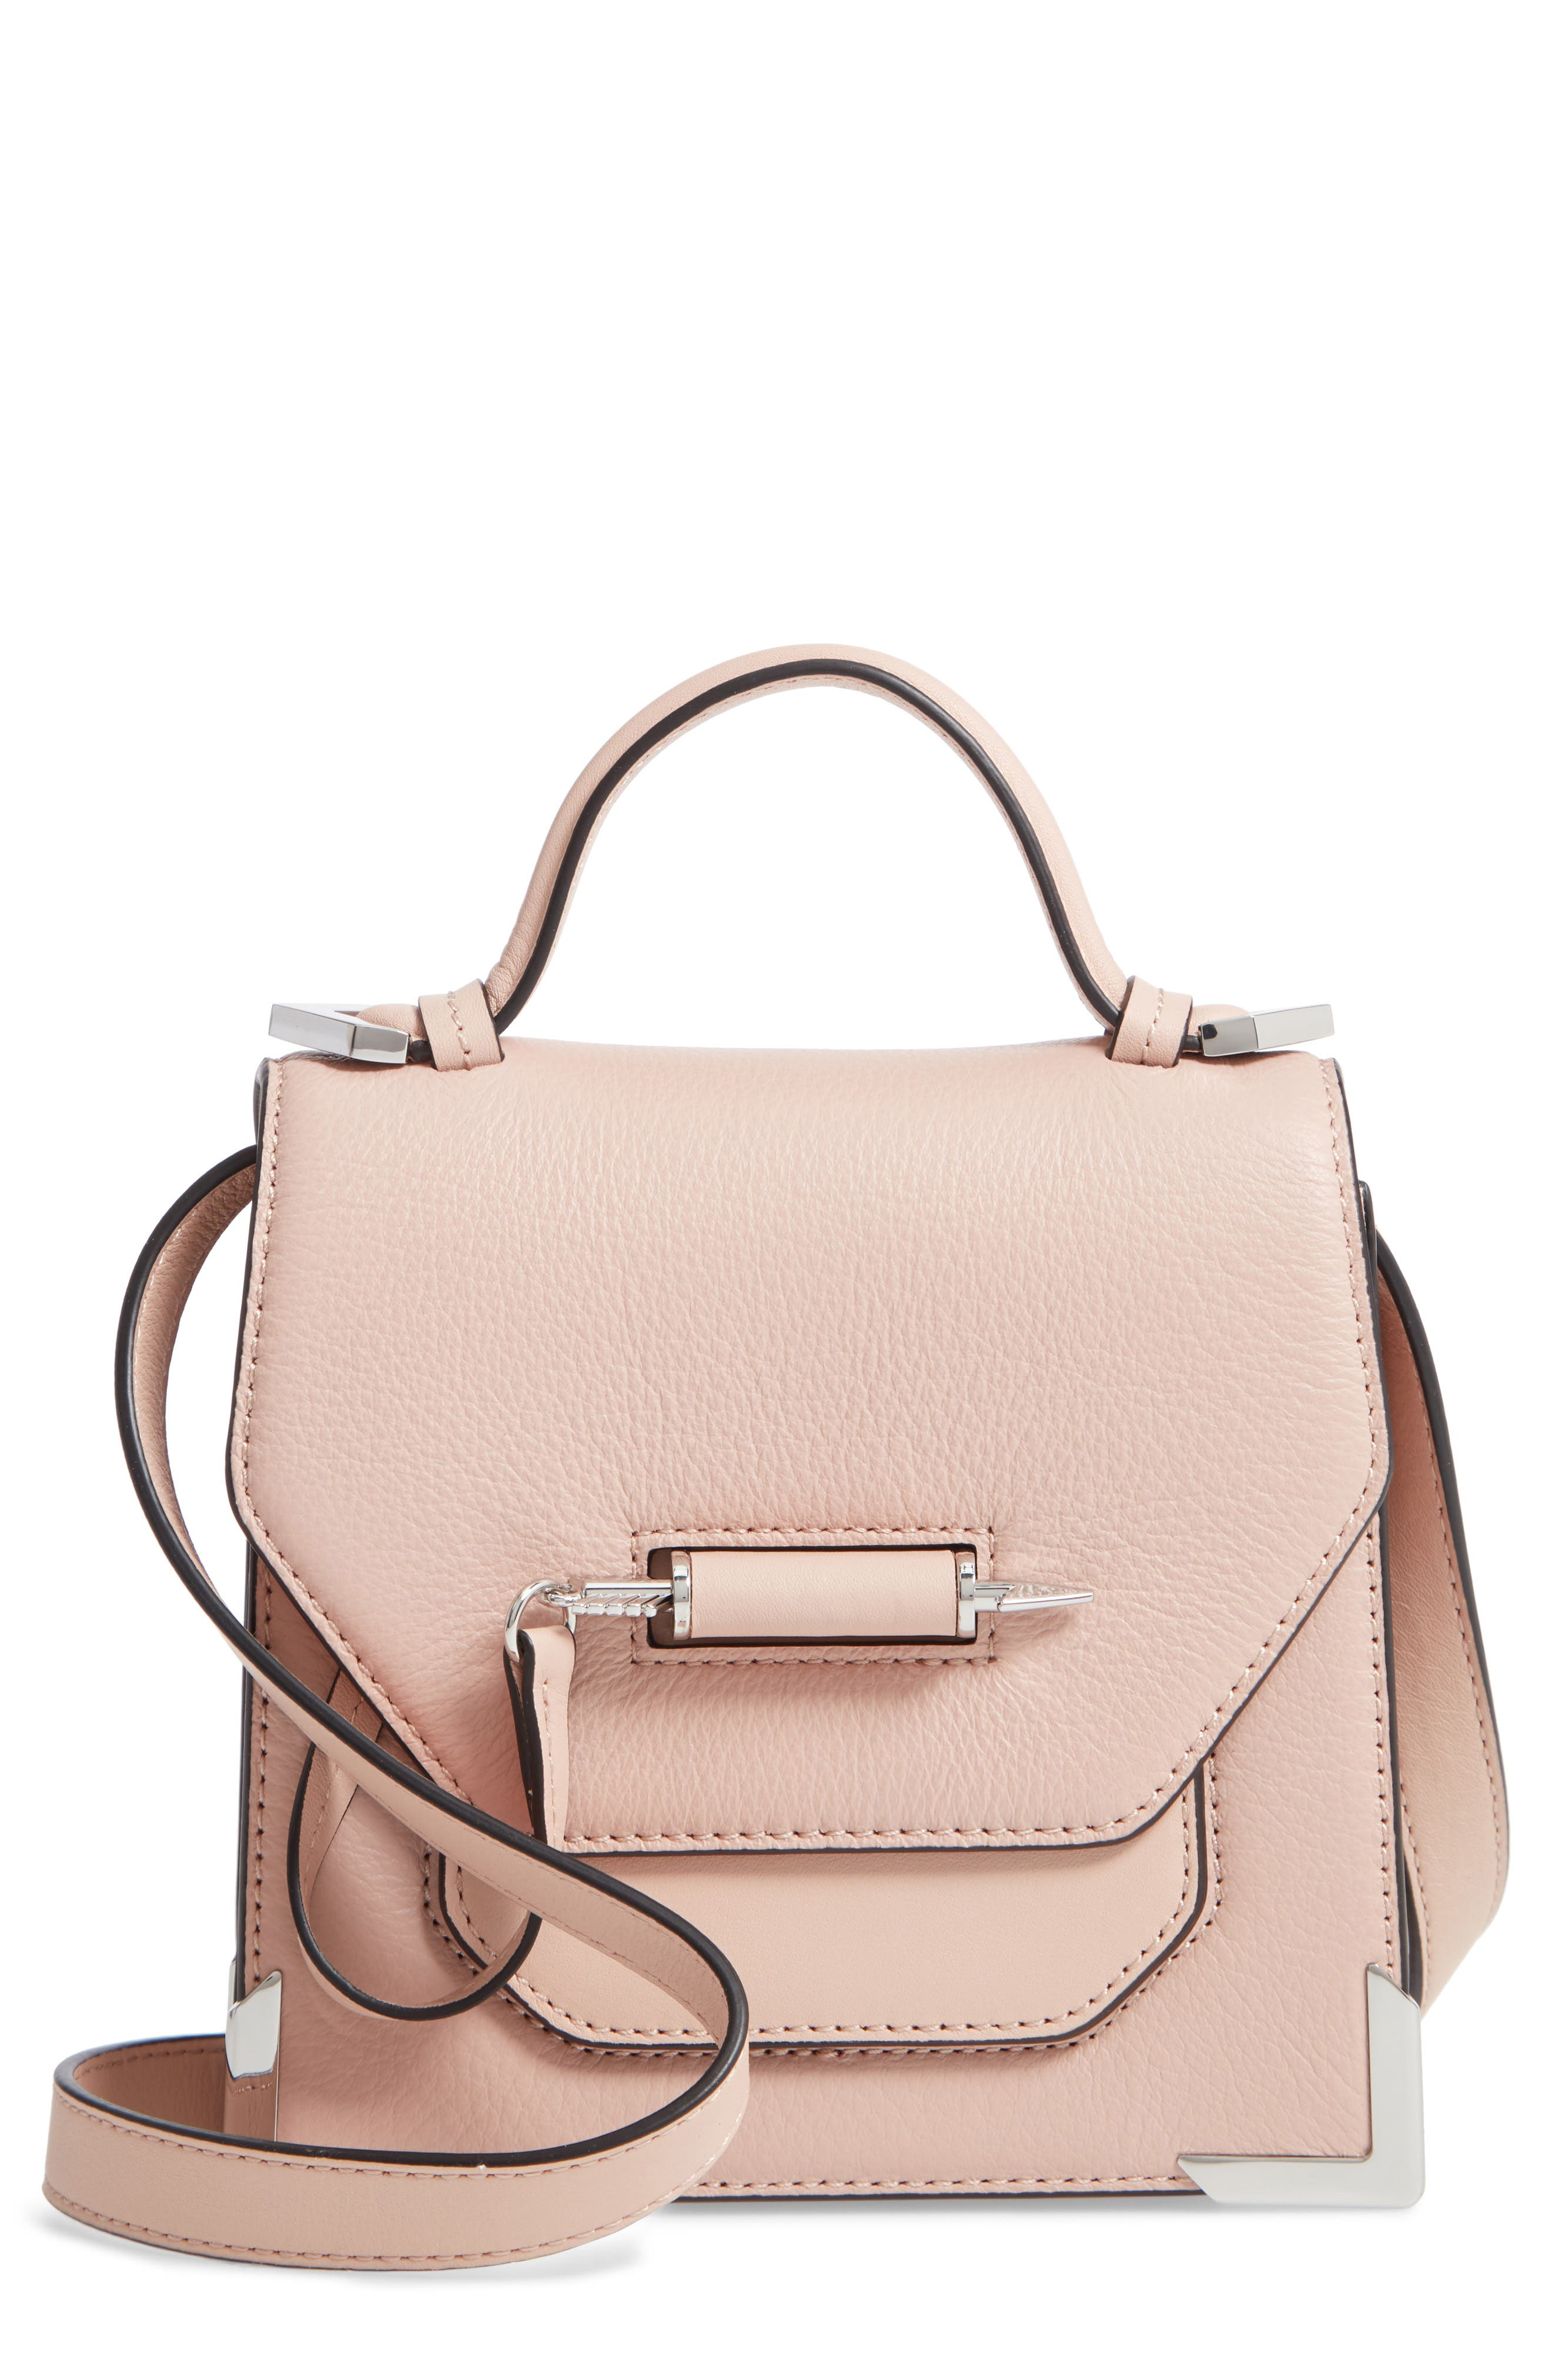 Mini Rubie Leather Shoulder Bag,                             Main thumbnail 1, color,                             PETAL/ GUNMETAL